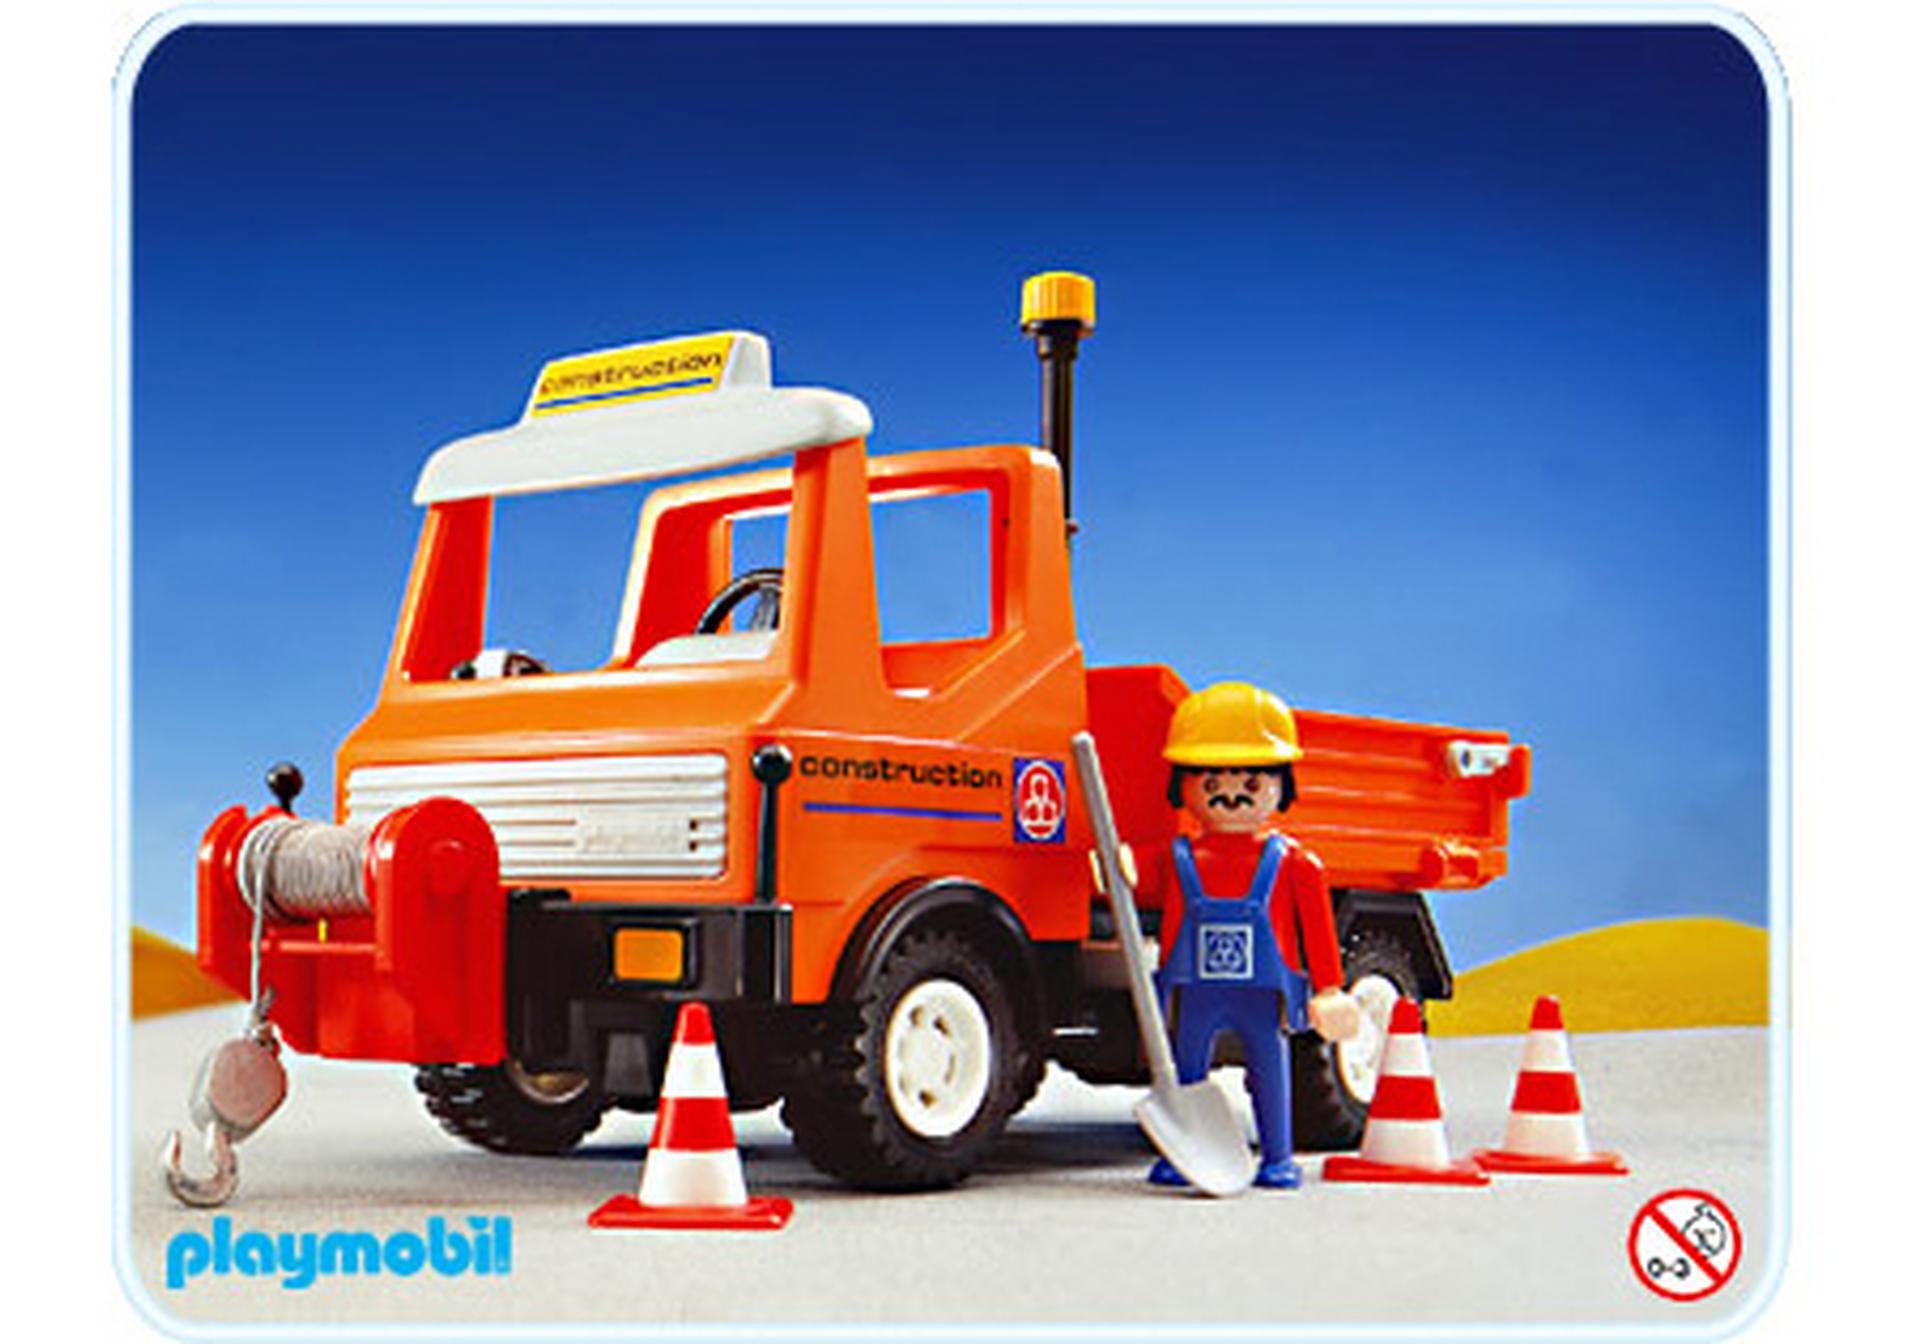 Camion de chantier 3755 a playmobil france - Playmobil camion chantier ...